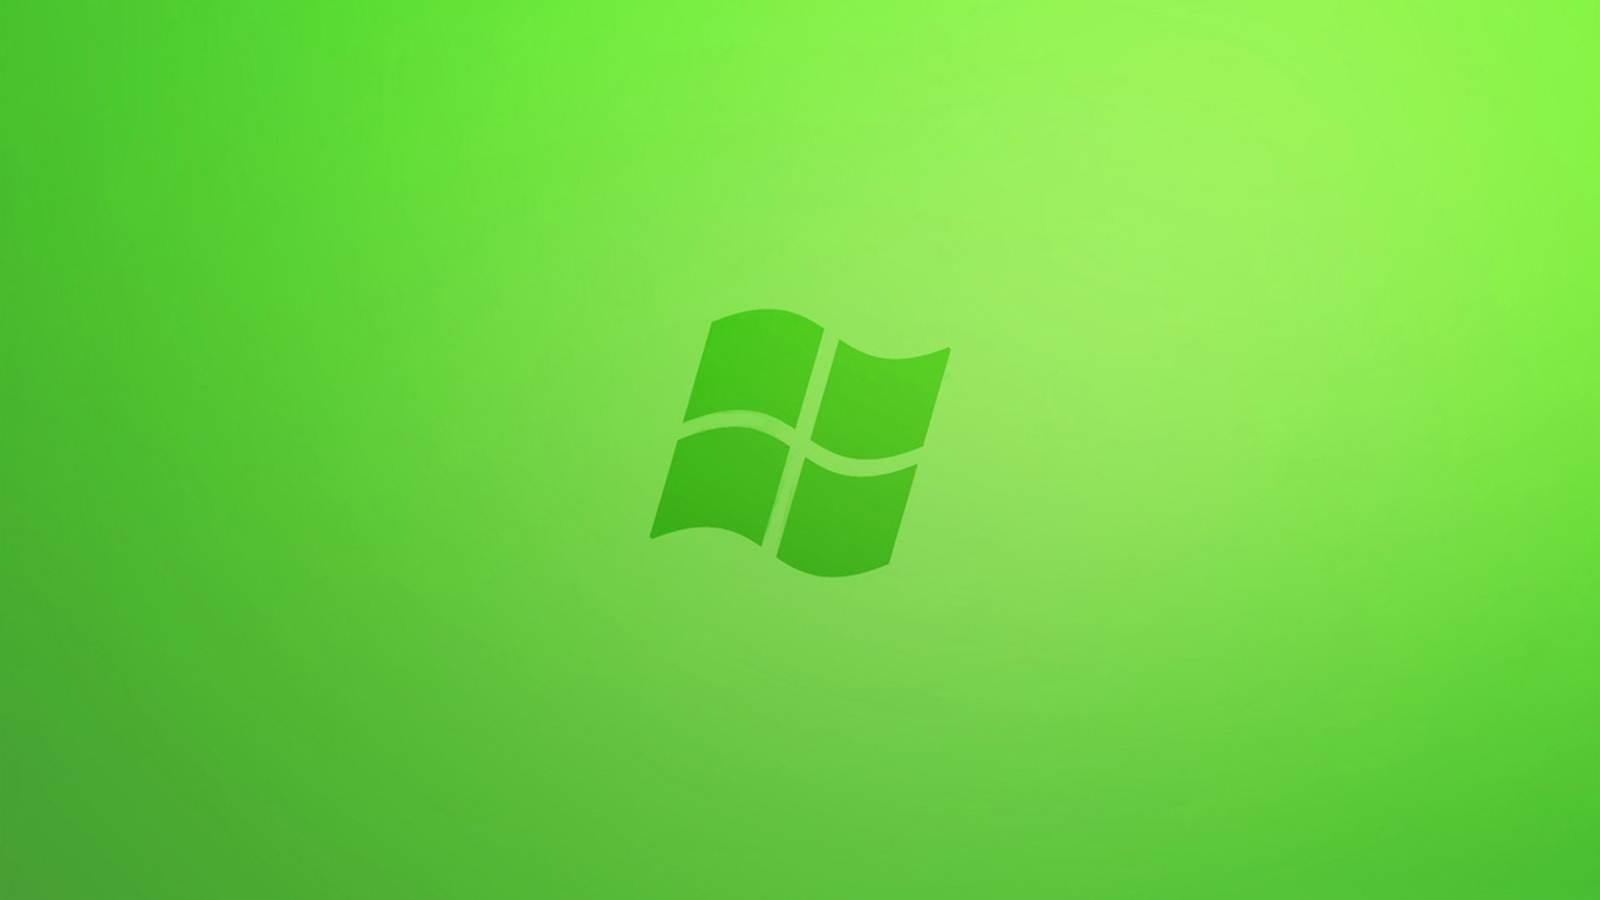 Download Wallpaper Windows XP, Vista, 7, 8, 8.1, 10, Background Windows XP,Vista,7,8,8.1,10, Gambar windows, logo Windows XP, Vista, 7, 8, 8.1, 10, image  Windows XP, Vista, 7, 8, 8.1, 10, Windows dari masa ke masa.